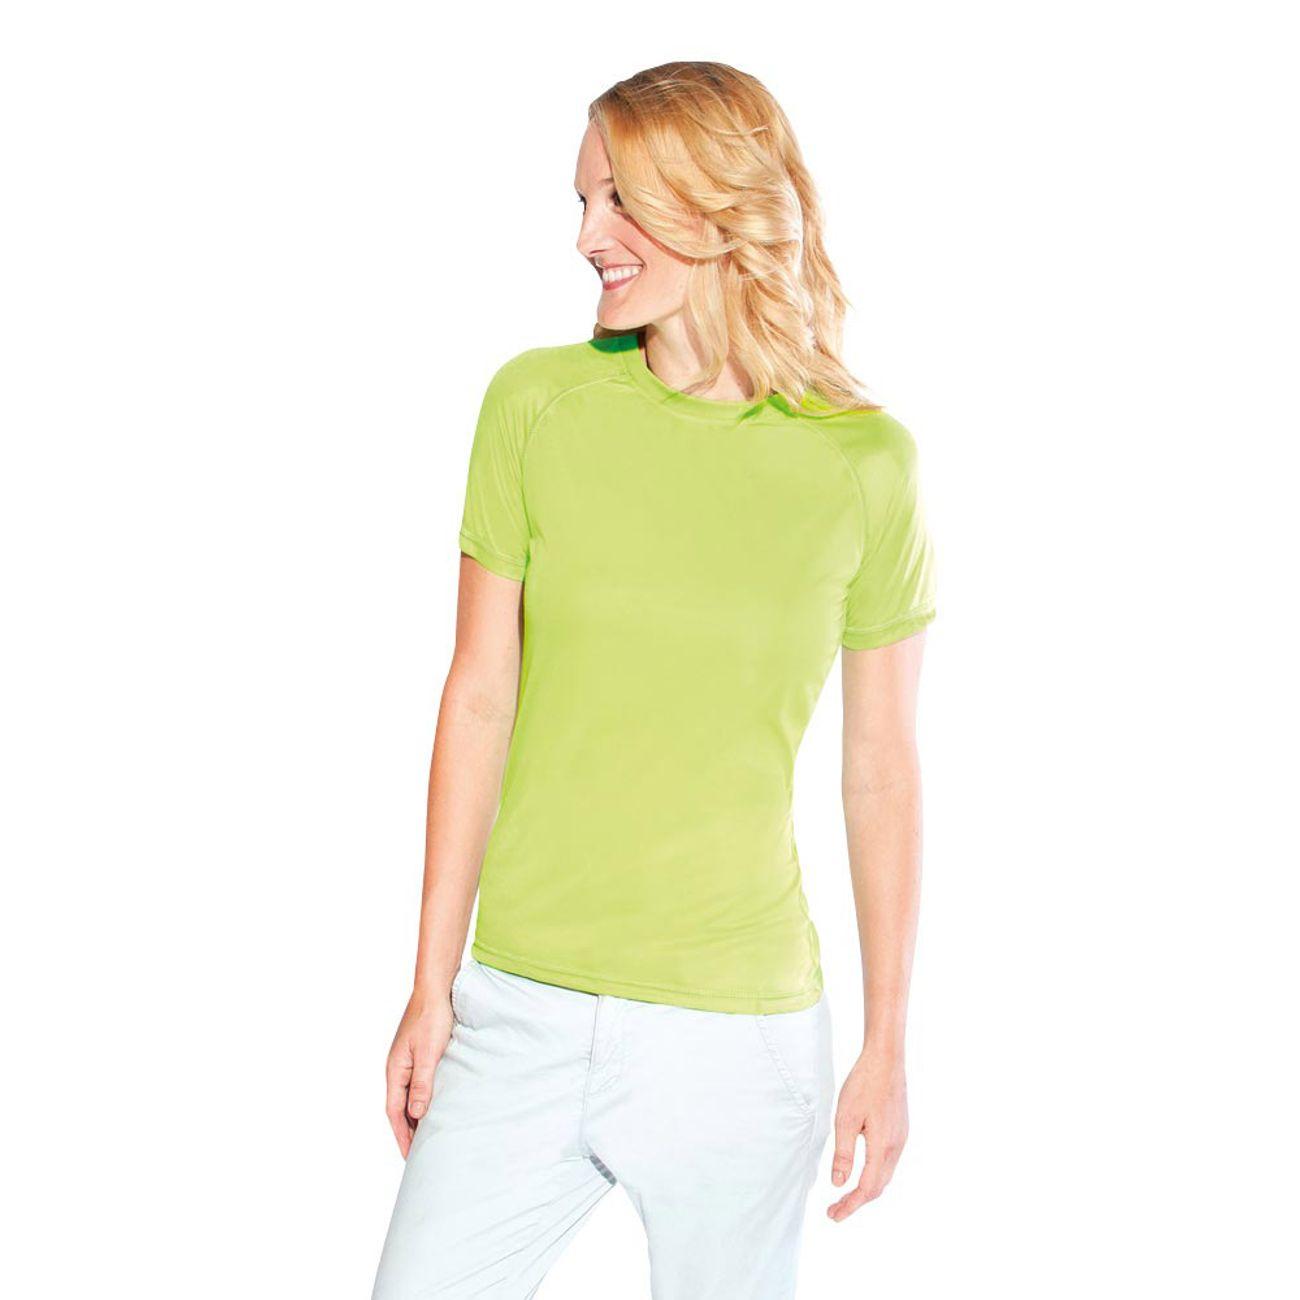 6118d2b802758 t-shirt-sport-femme-grande-taille_1_v1.jpeg